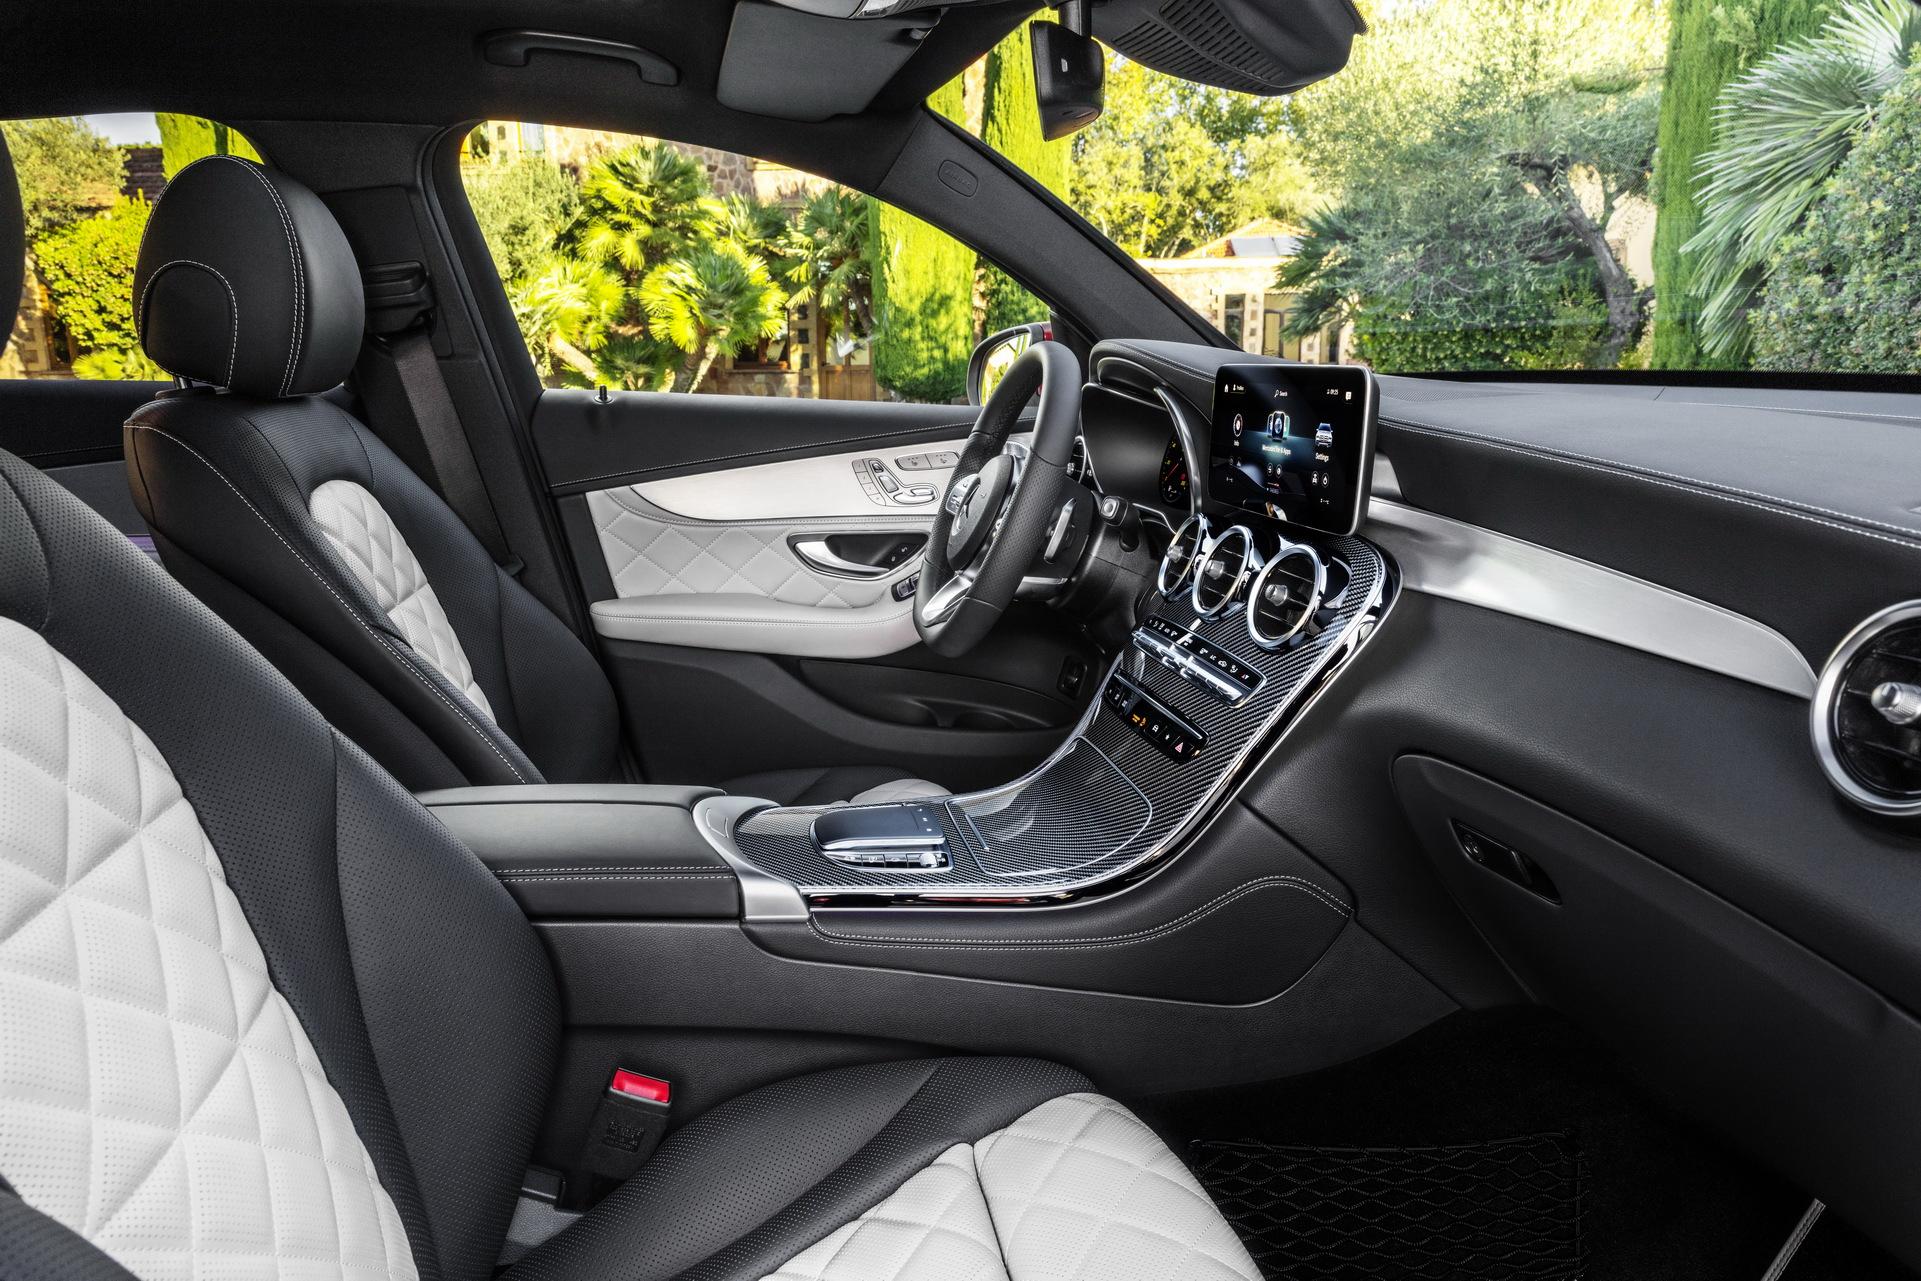 2020-mercedes-benz-glc-coupe-9.jpg